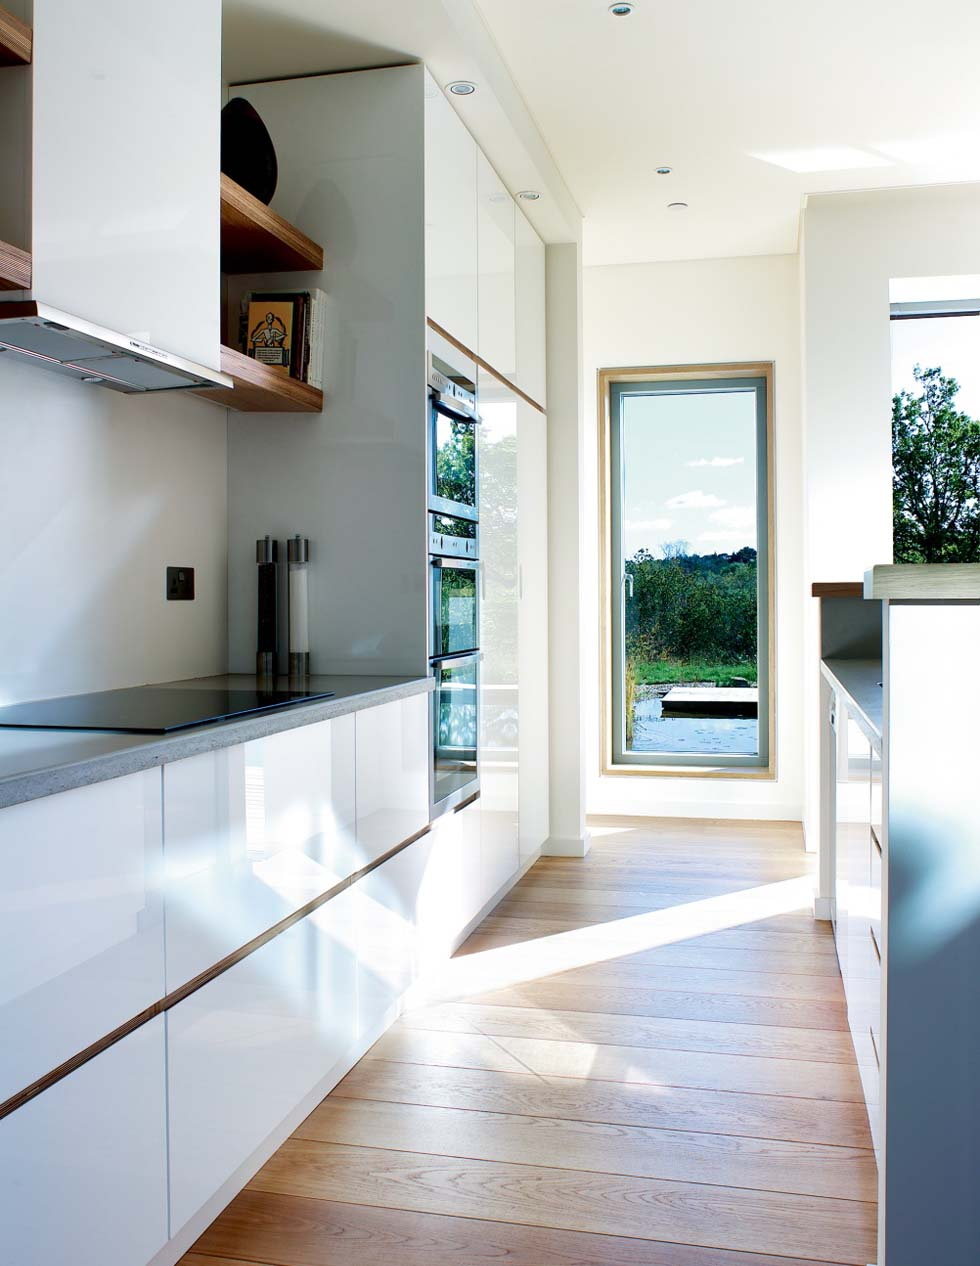 Pad house kitchen